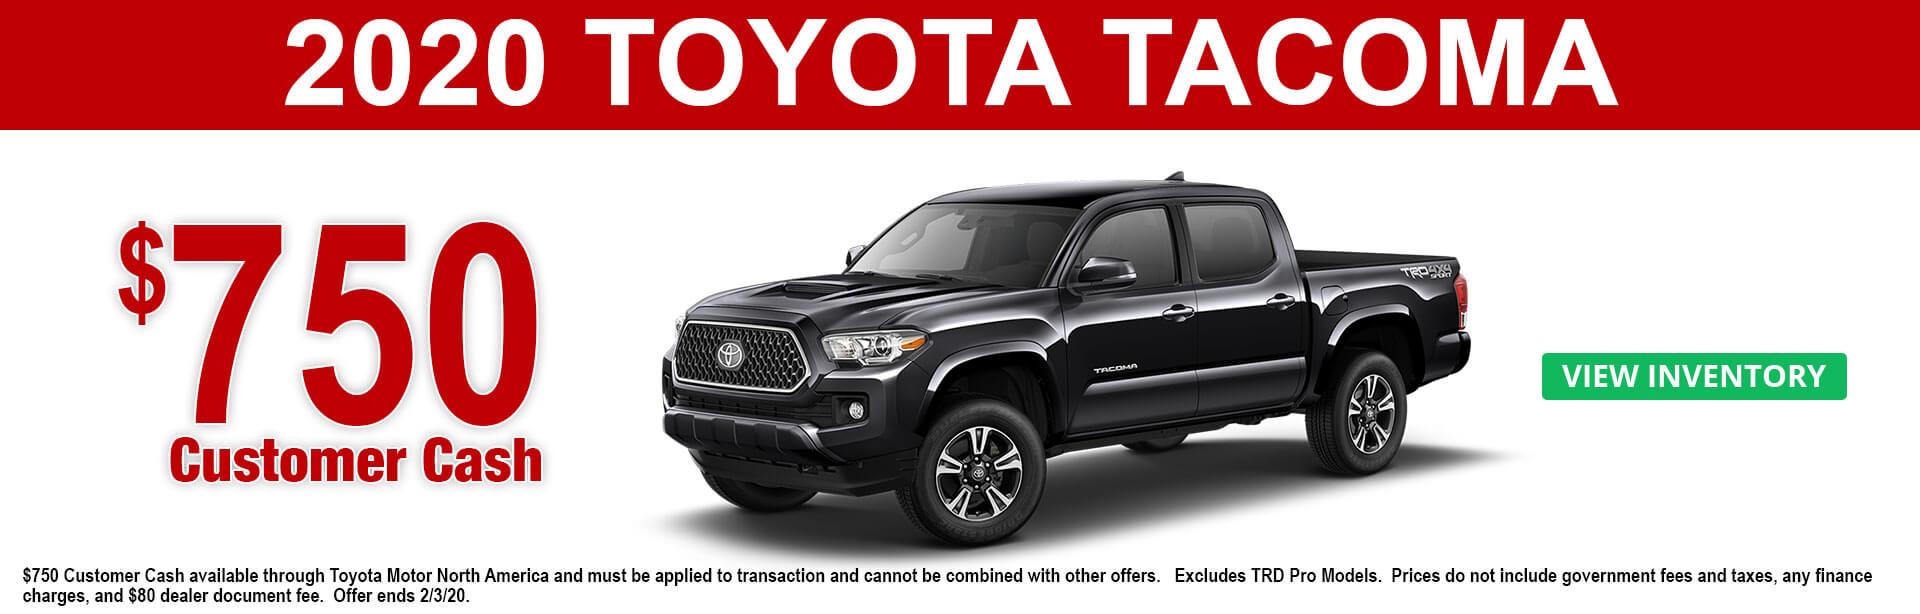 2020 Toyota Tacoma Cash Offer